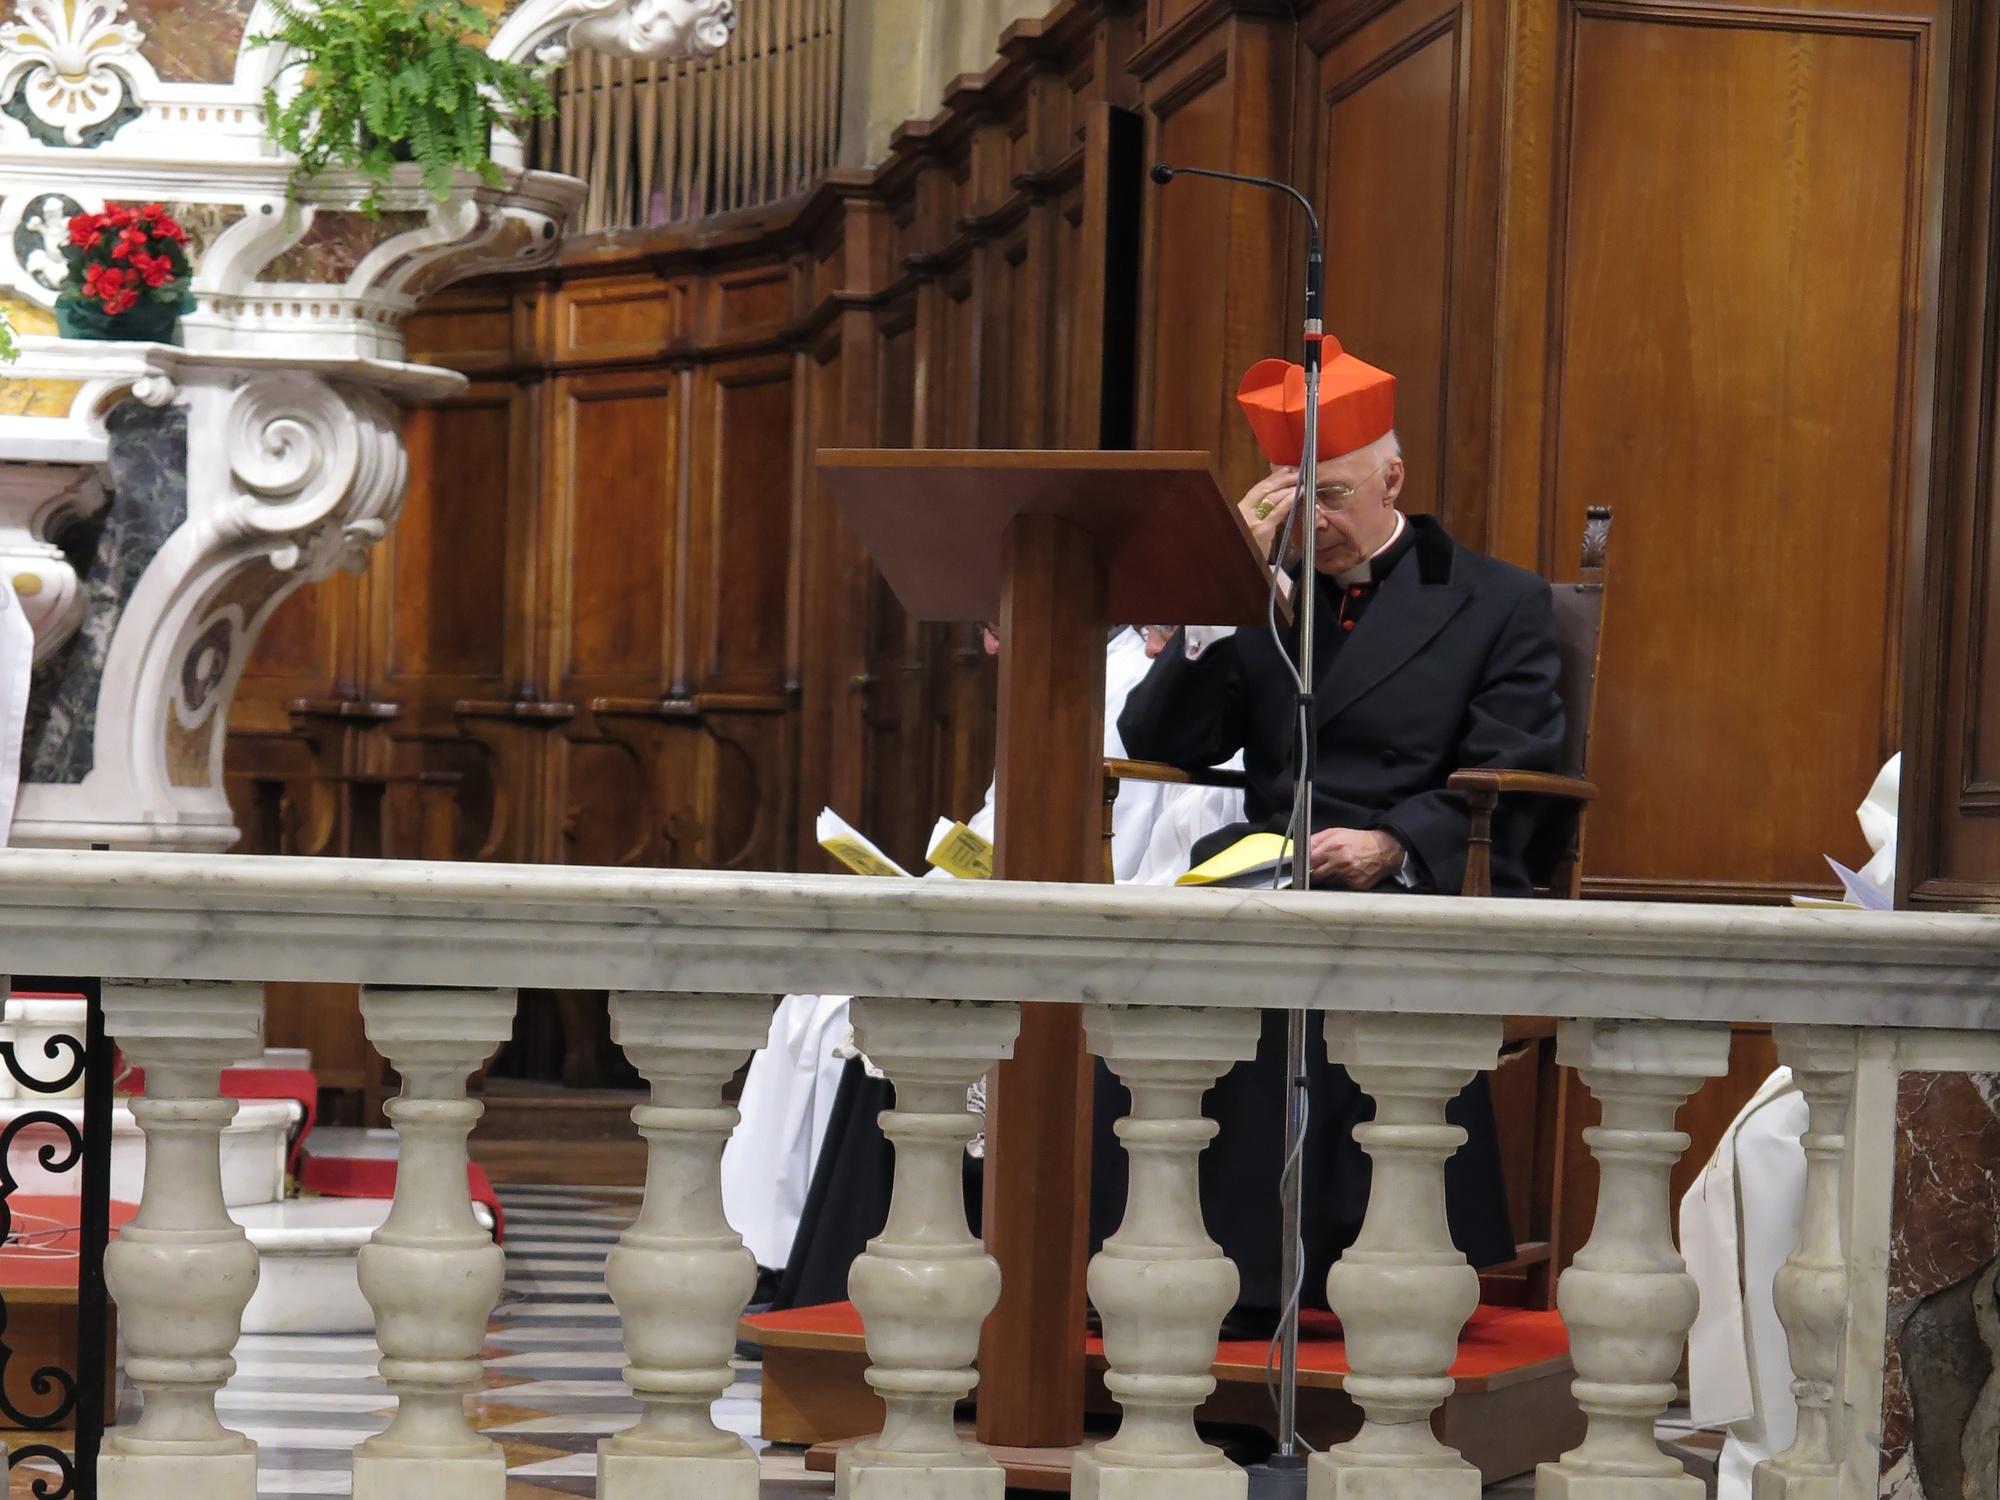 veglia-martiri-missionari-sturla-2016-04-02-21-07-41